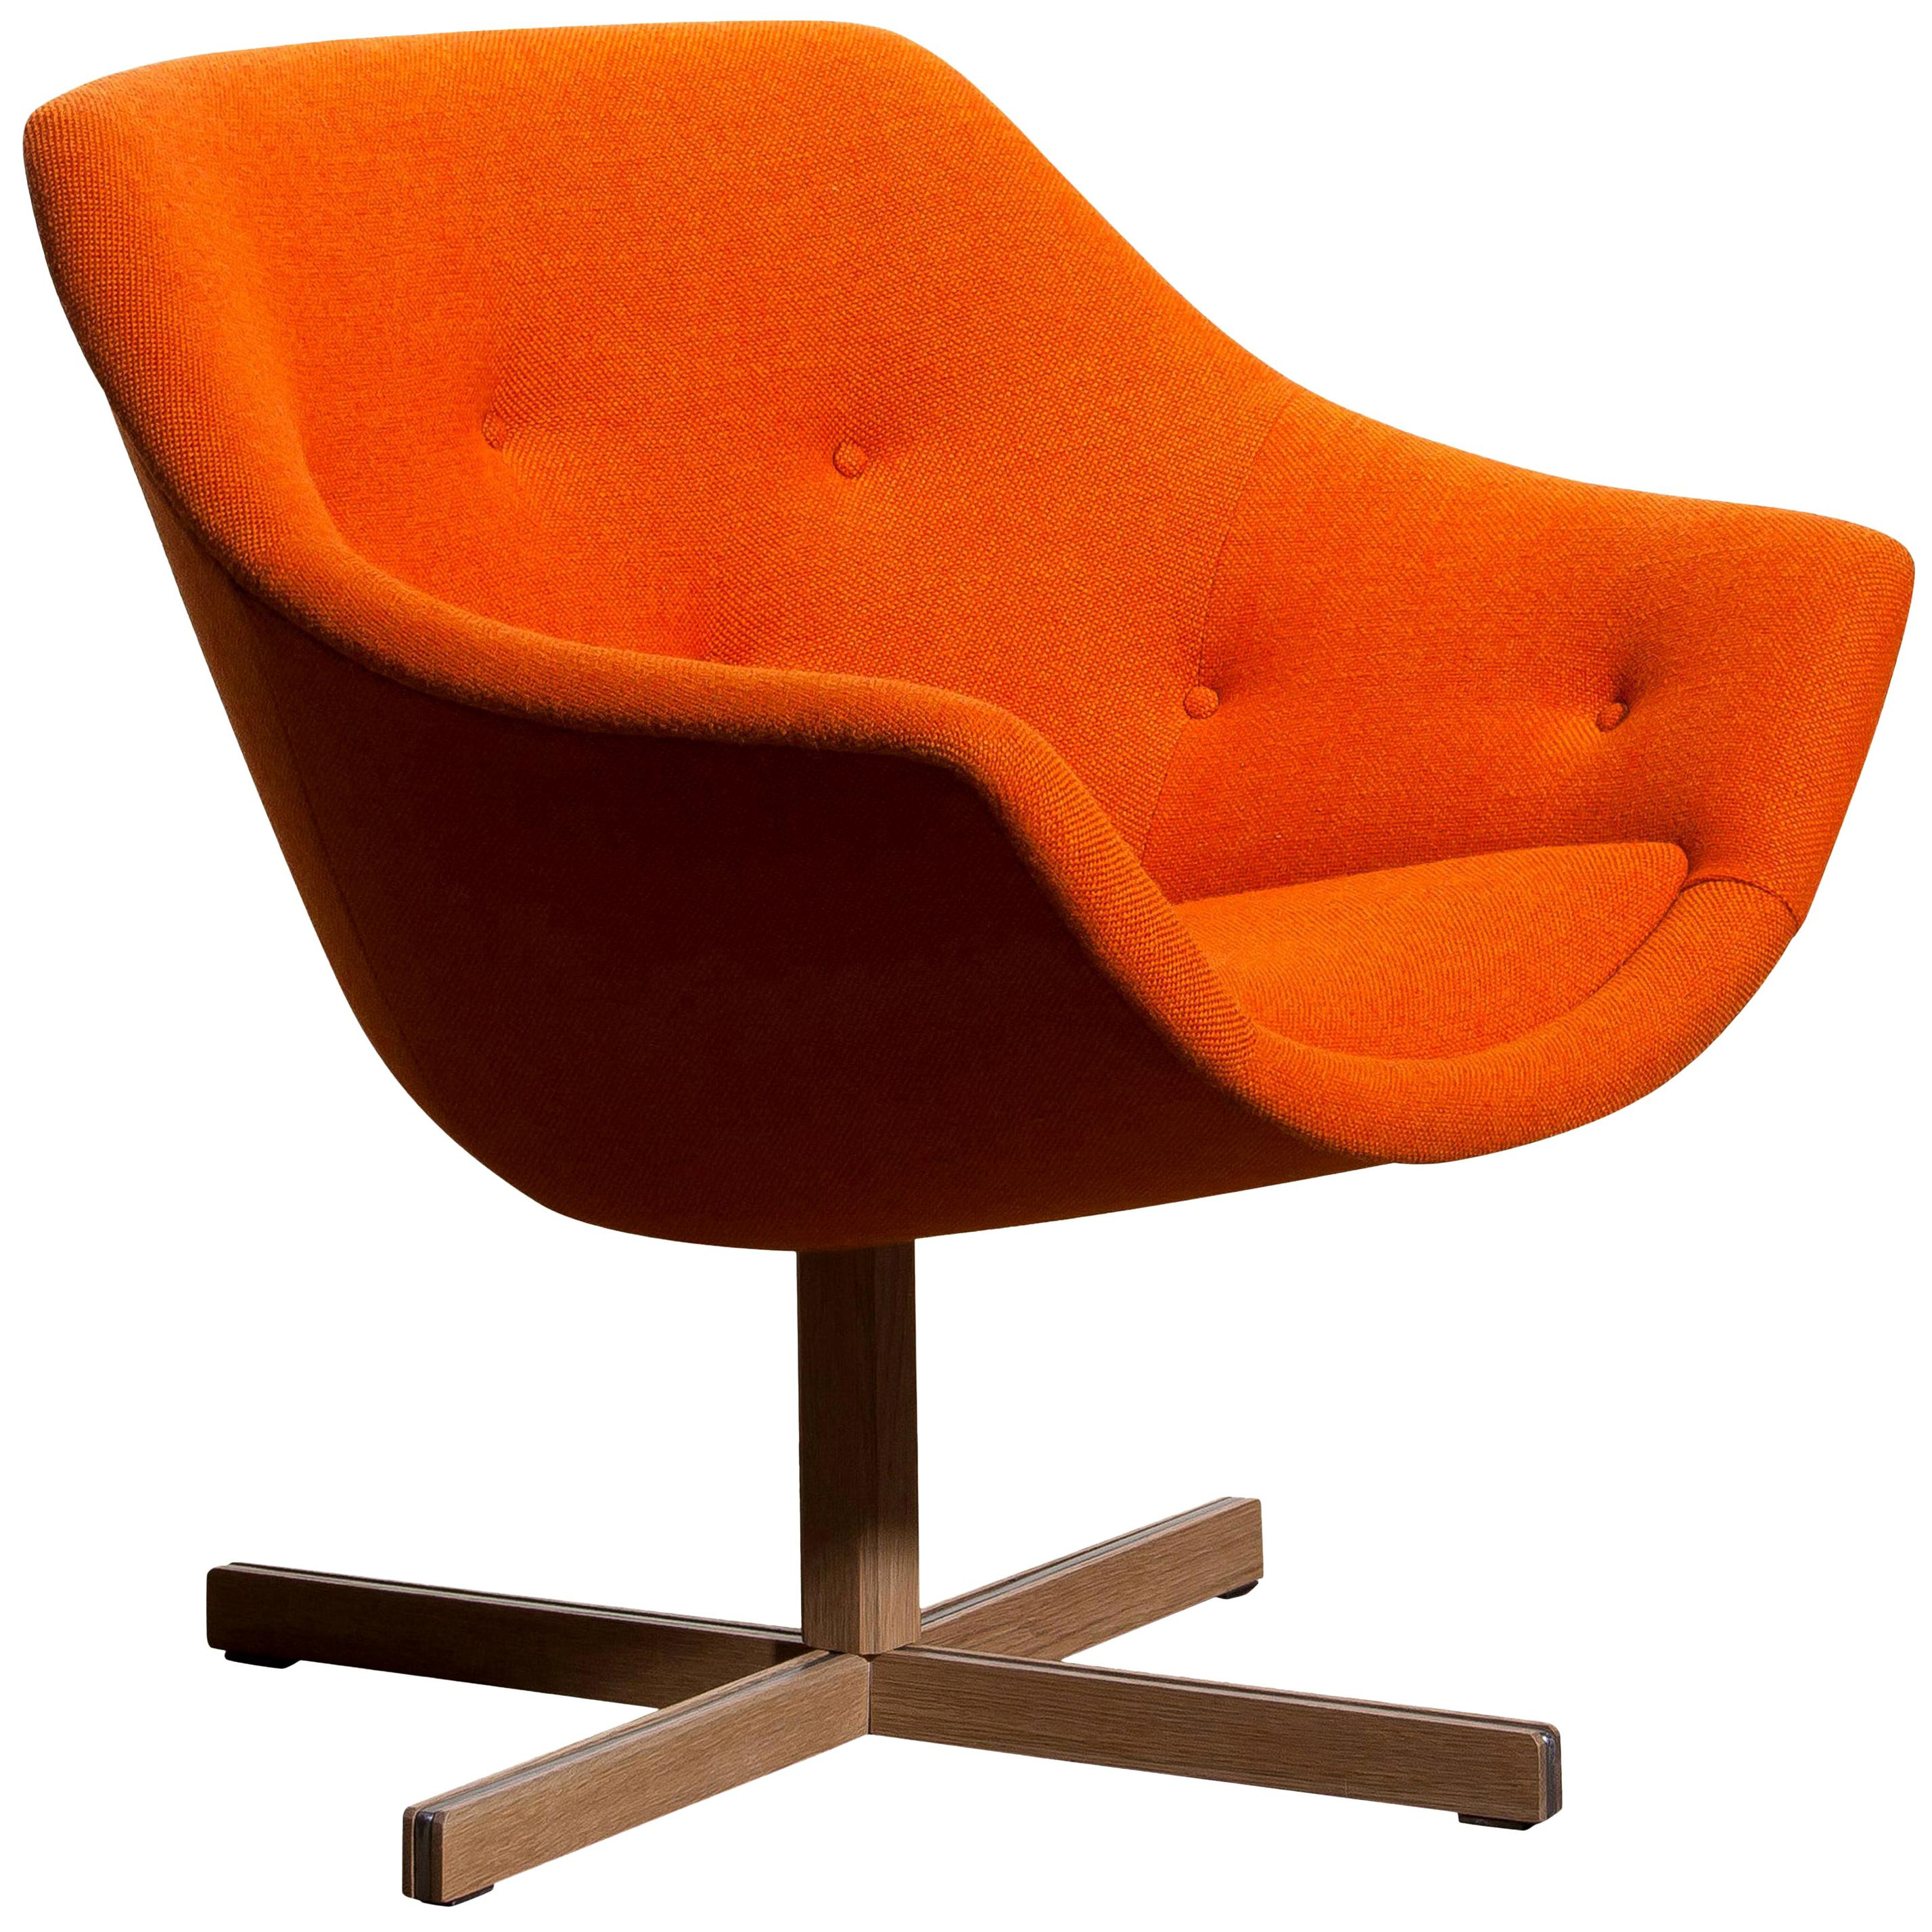 1960s, 'Mandarini' Swivel Armchair by Carl Gustaf Hiort and Nanna Ditzel